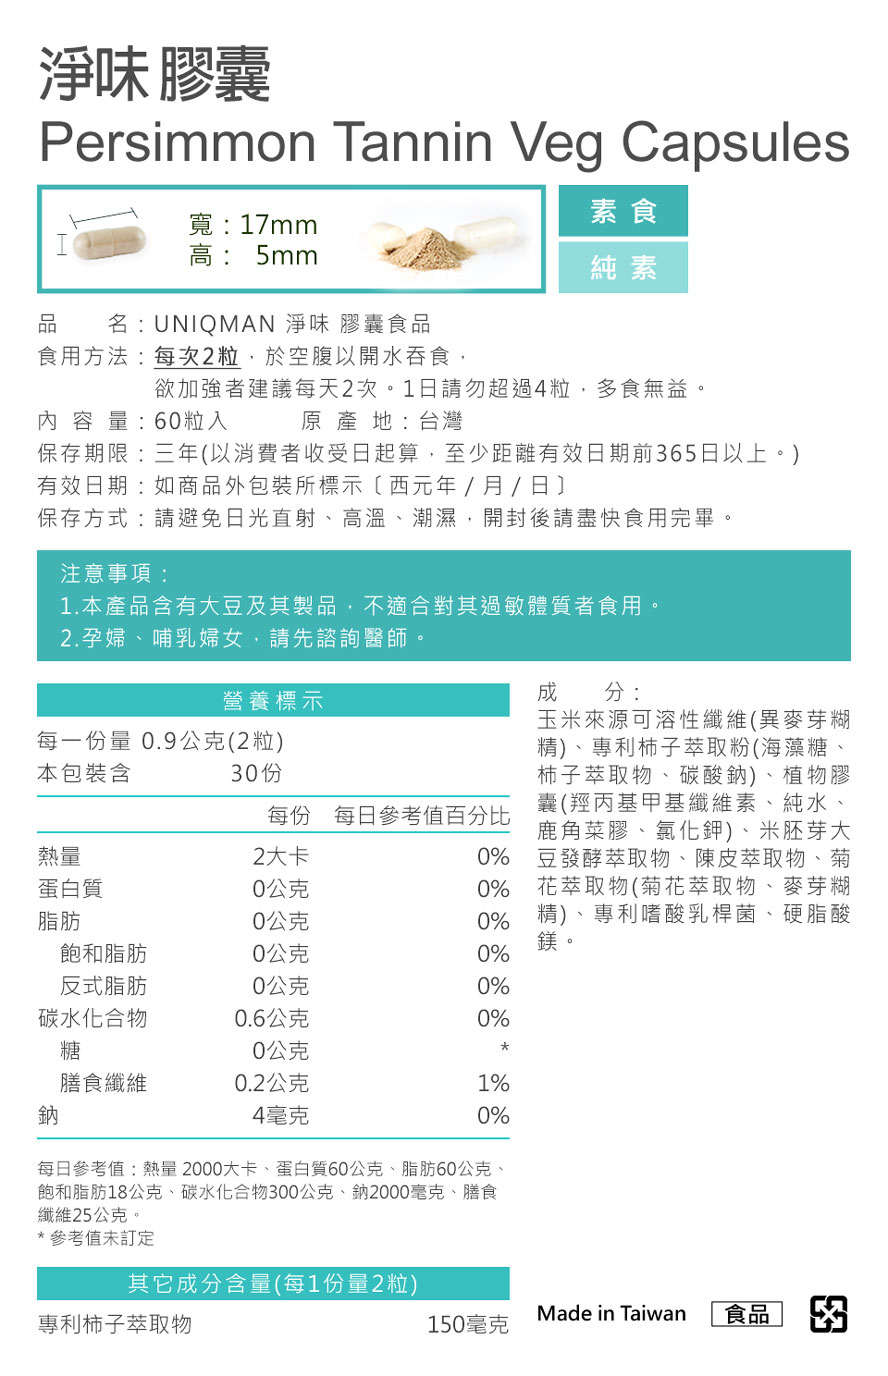 UNIQMAN淨味膠囊通過安全檢驗,無副作用,素食可食